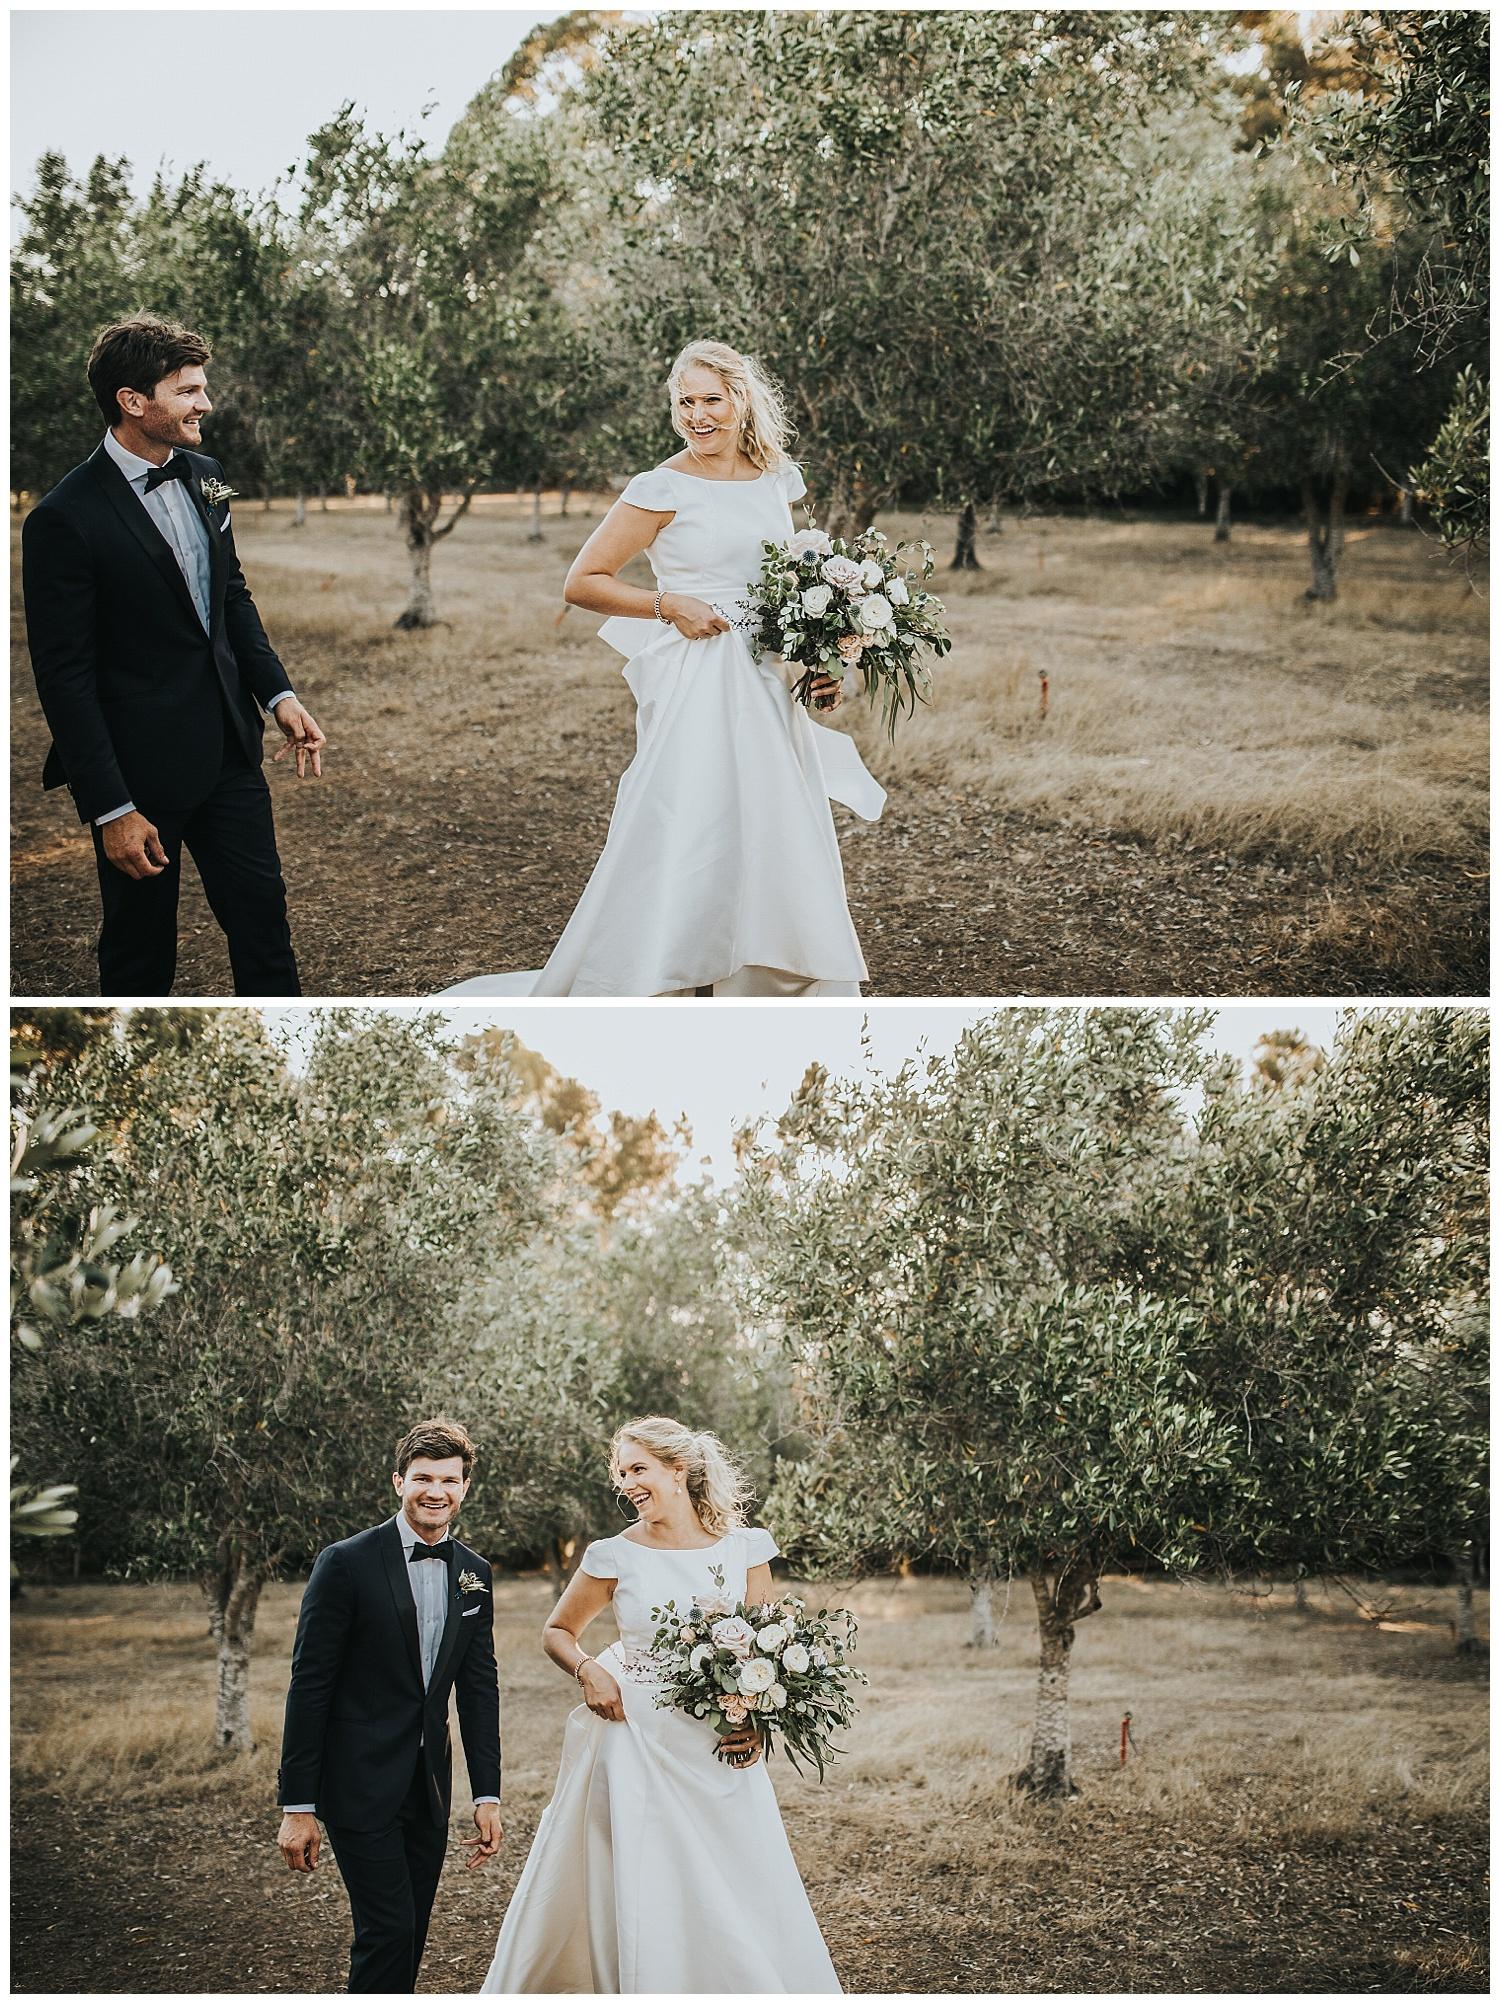 olio_bello_wedding_keeper_creative_027.JPG